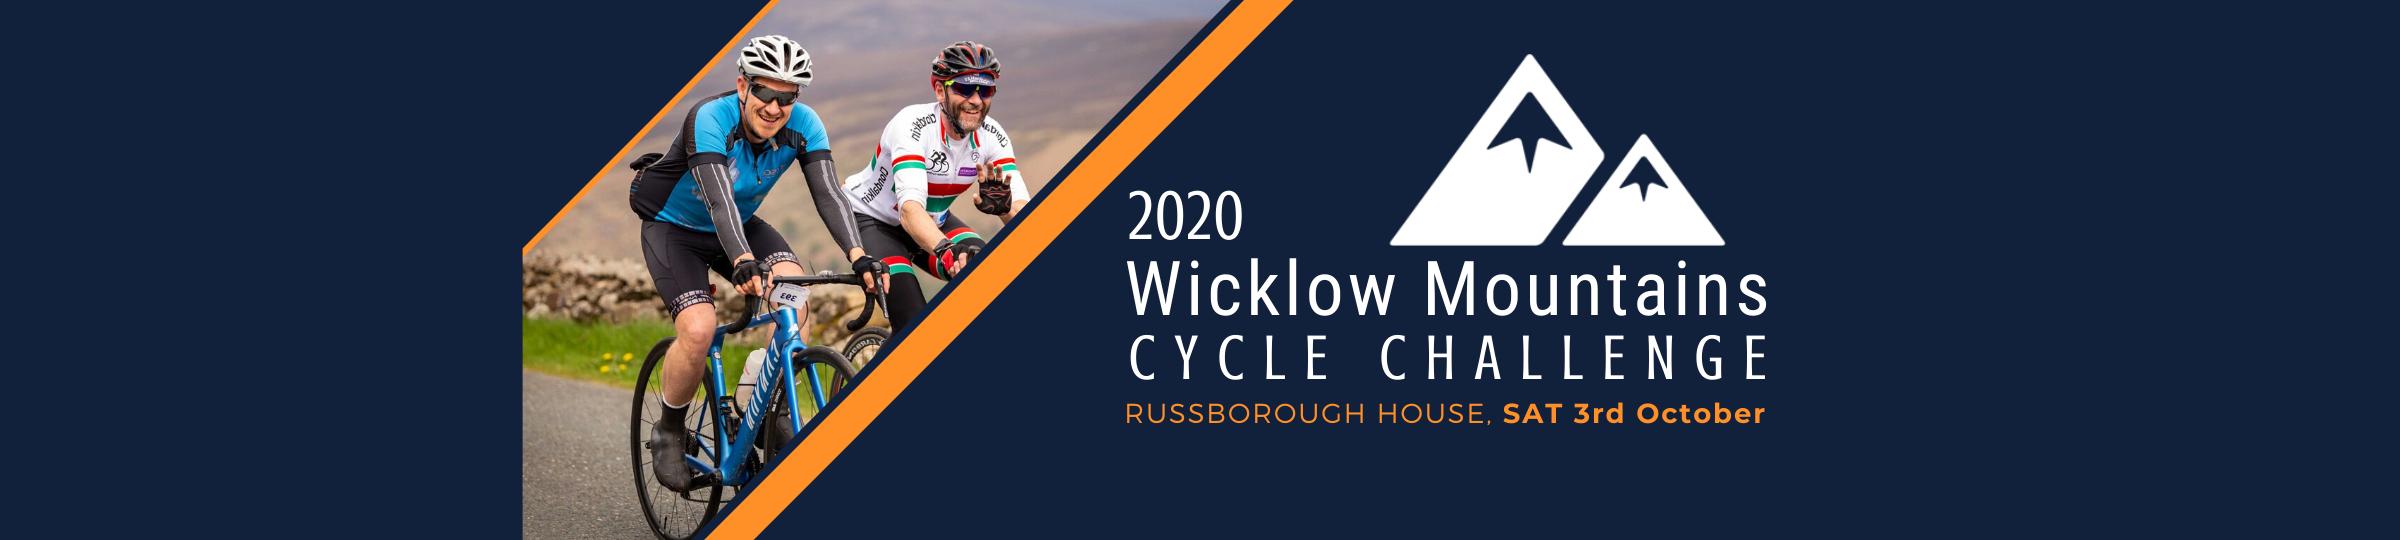 Web-slider-wicklow-2020